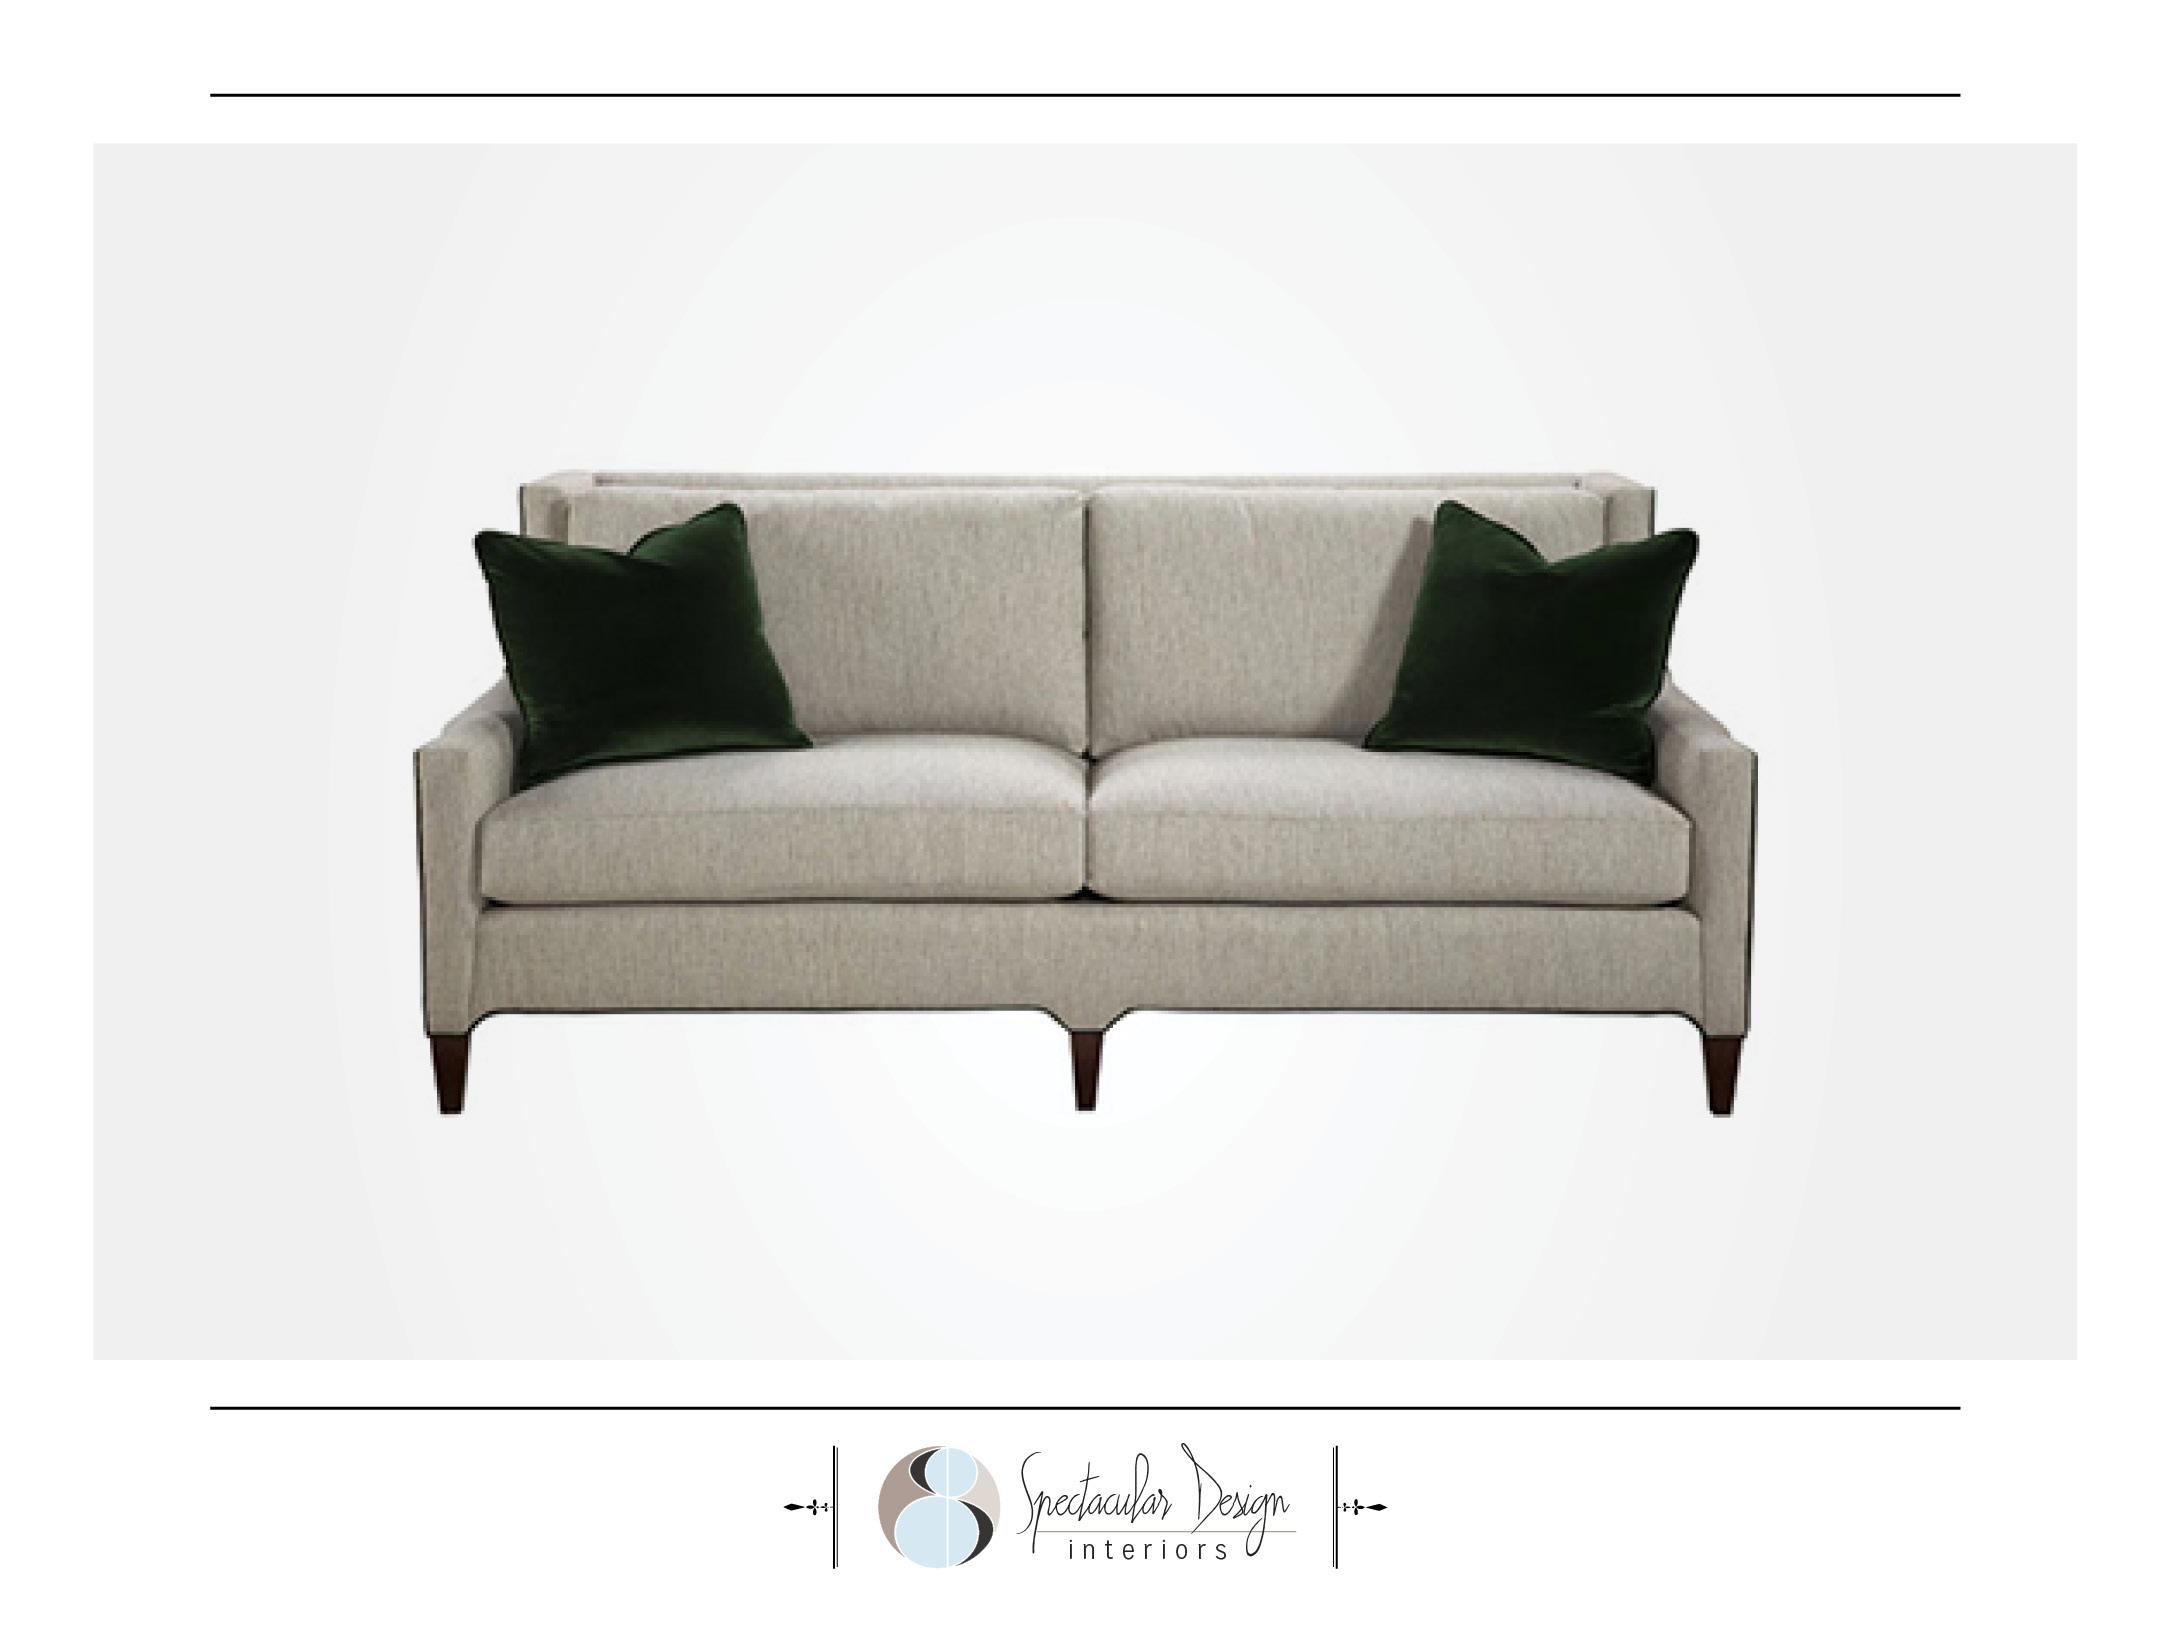 spectacular-design-showroom-showcase-sofas-custom-furniture2.jpg